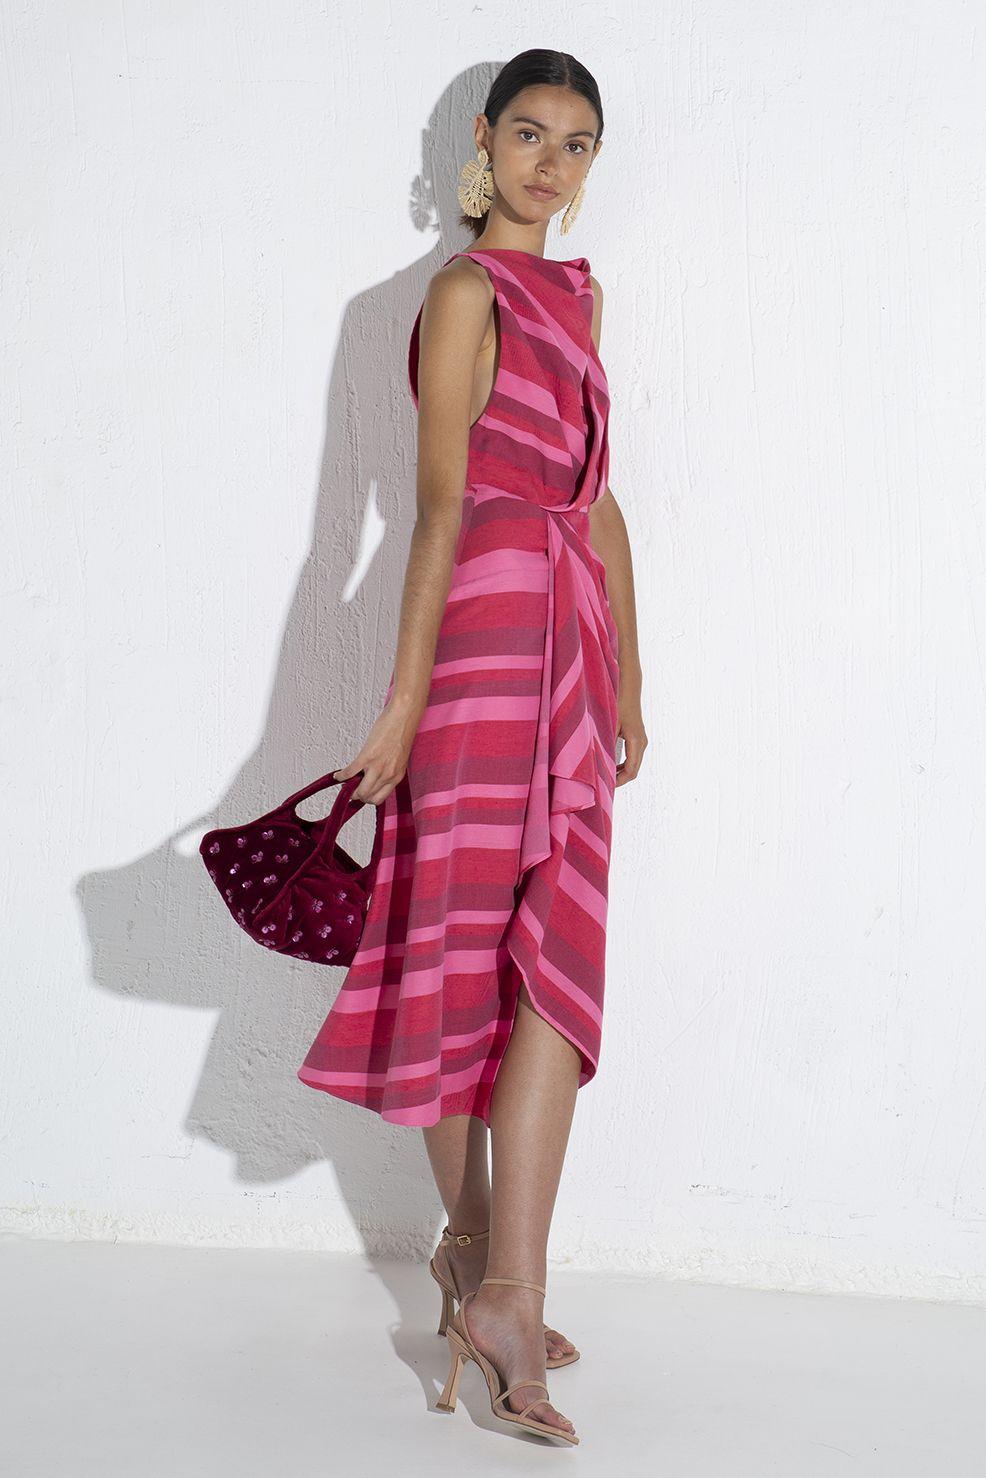 acler-faver-vestido-midi-rojo-fruncido-5